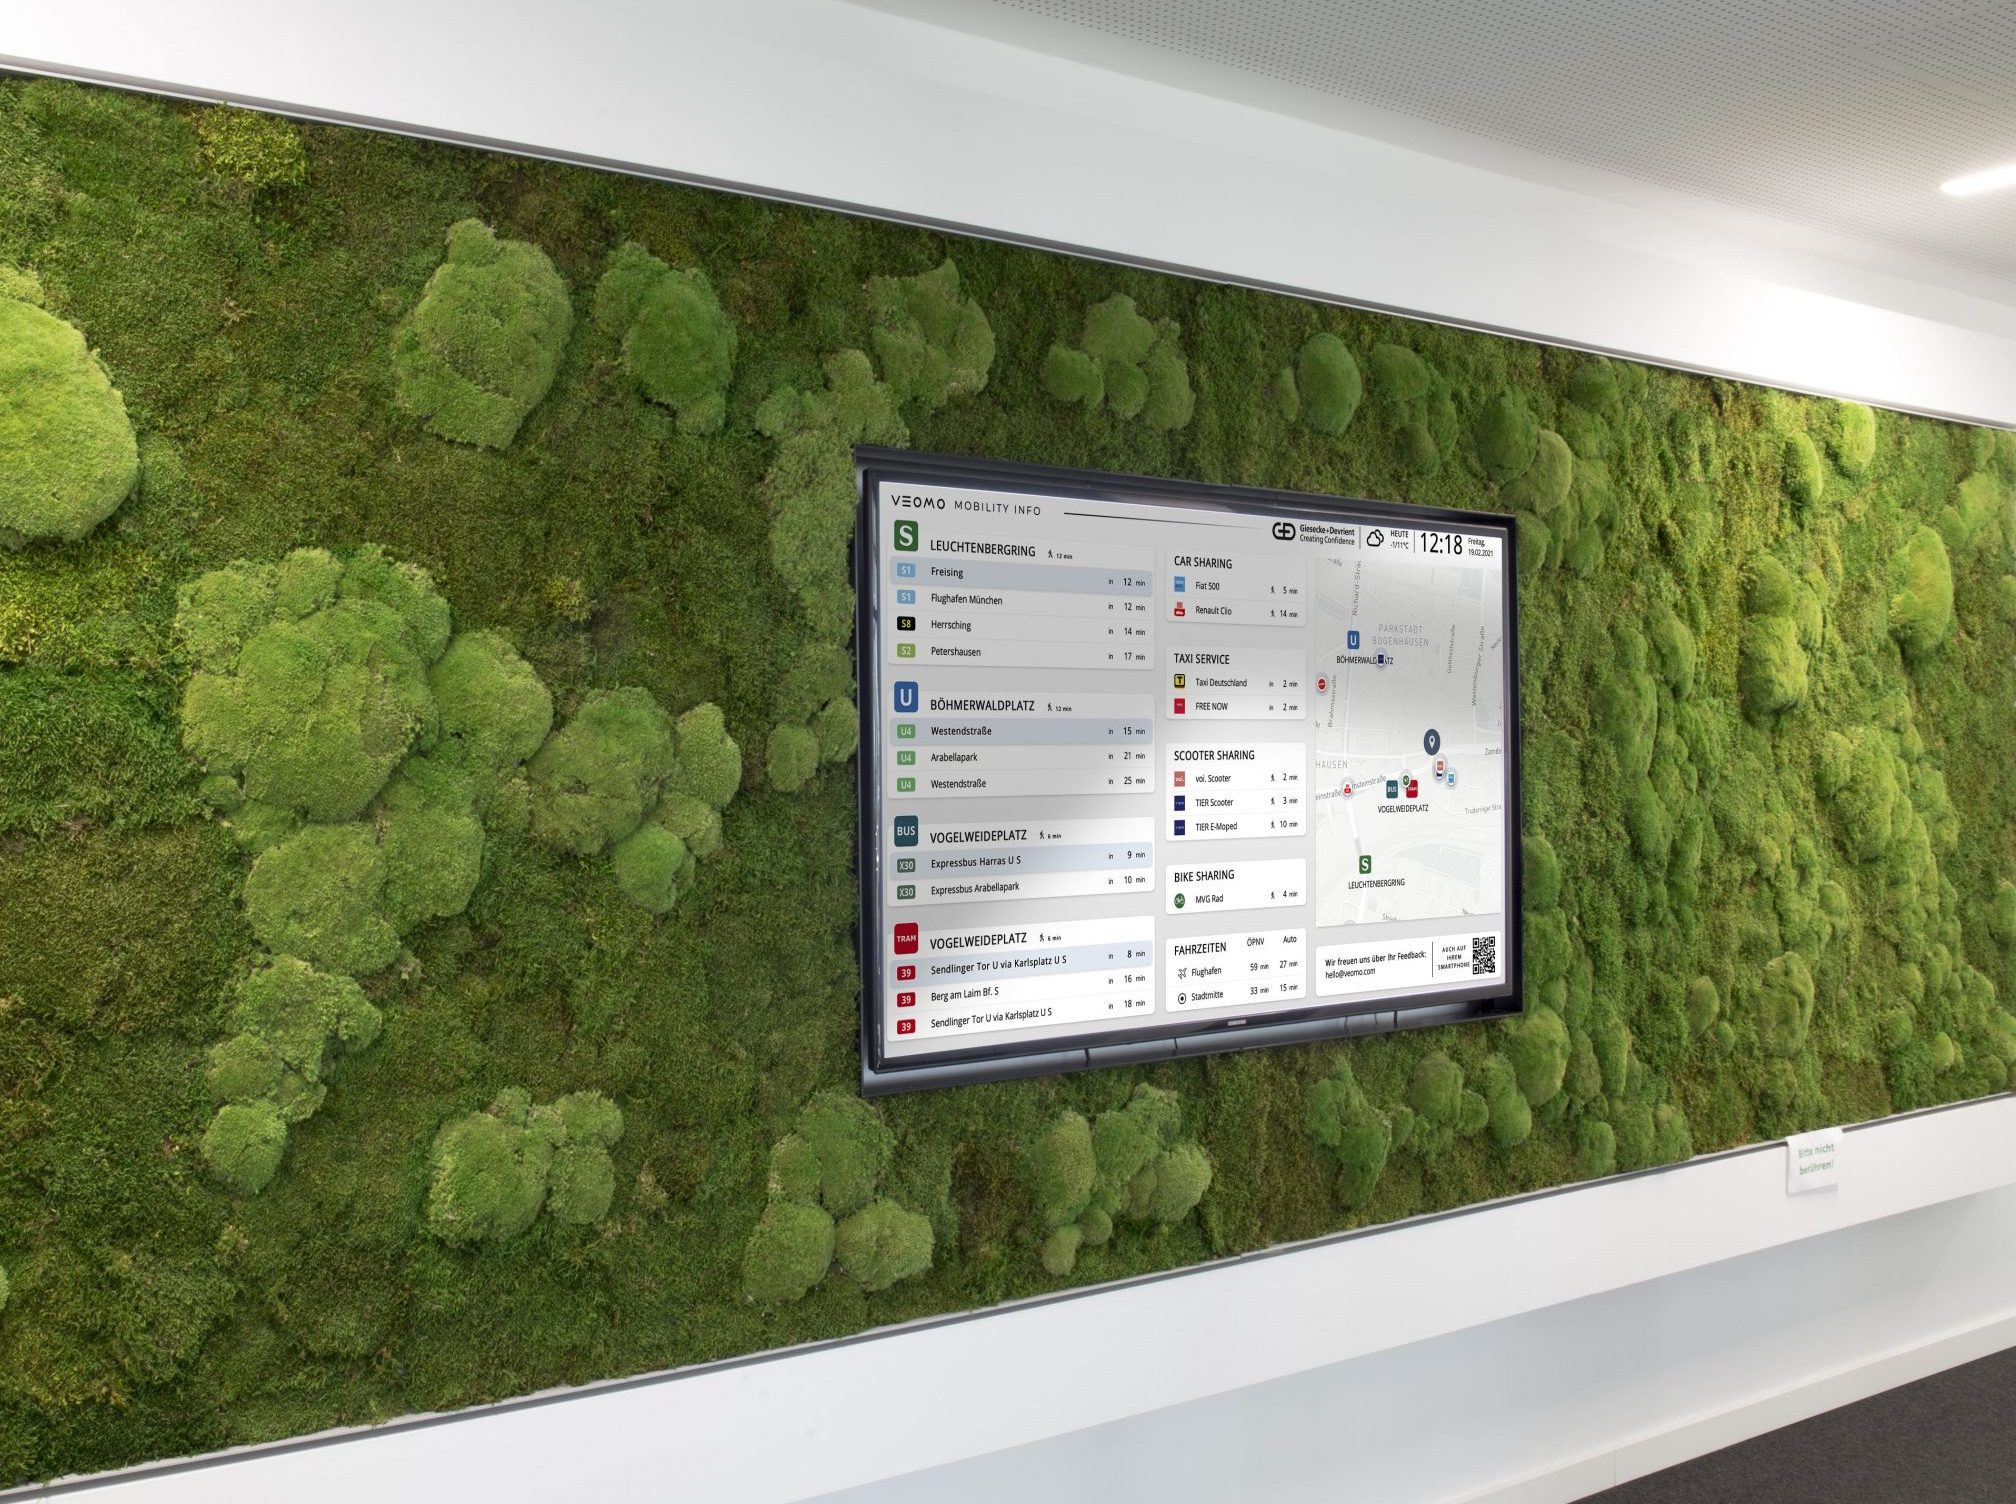 Bürofläche mit Bildschrim an der wand